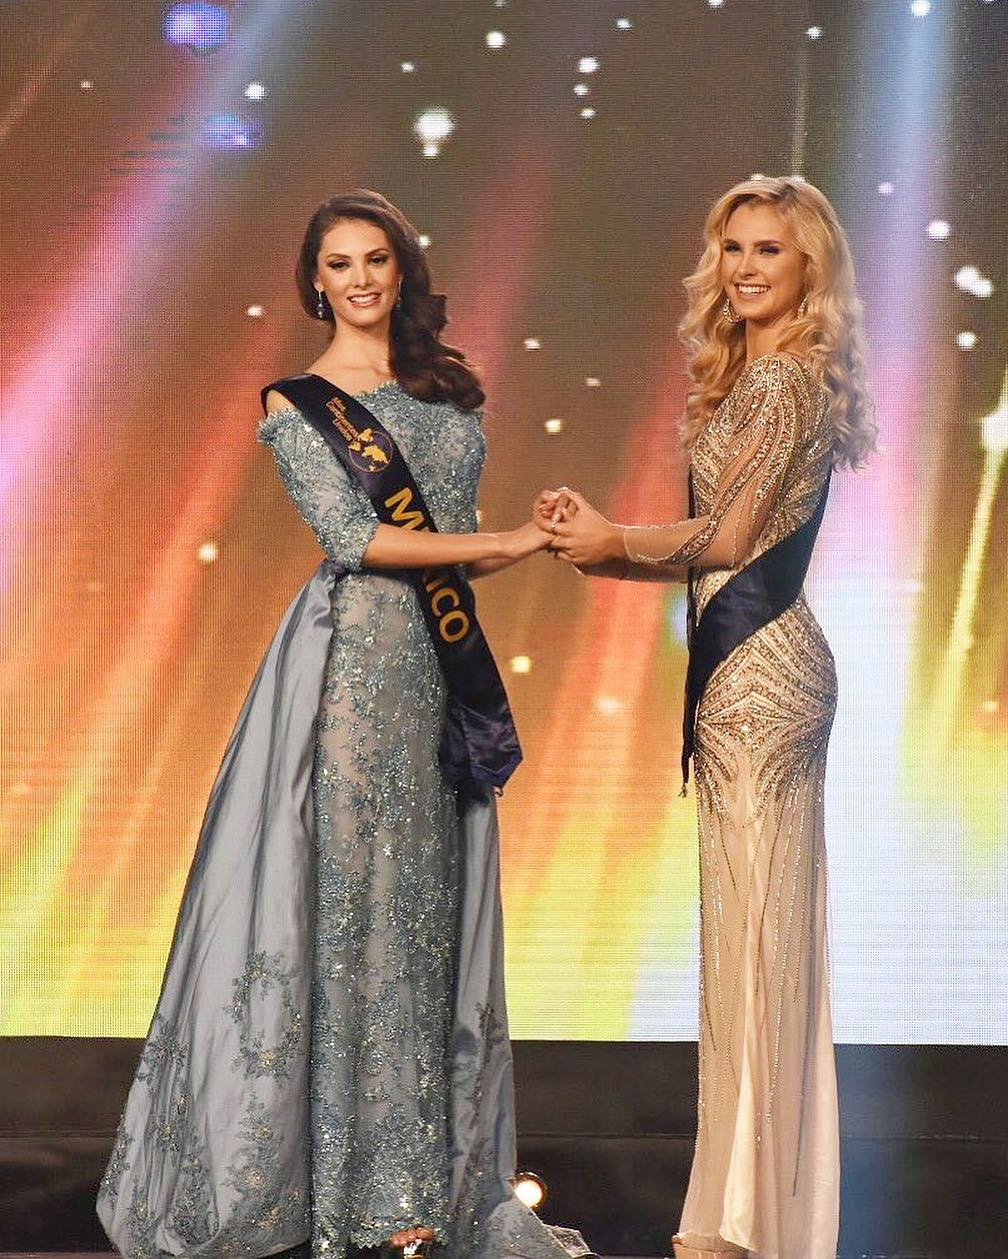 andrea saenz, miss continentes unidos 2018. - Página 5 42004110